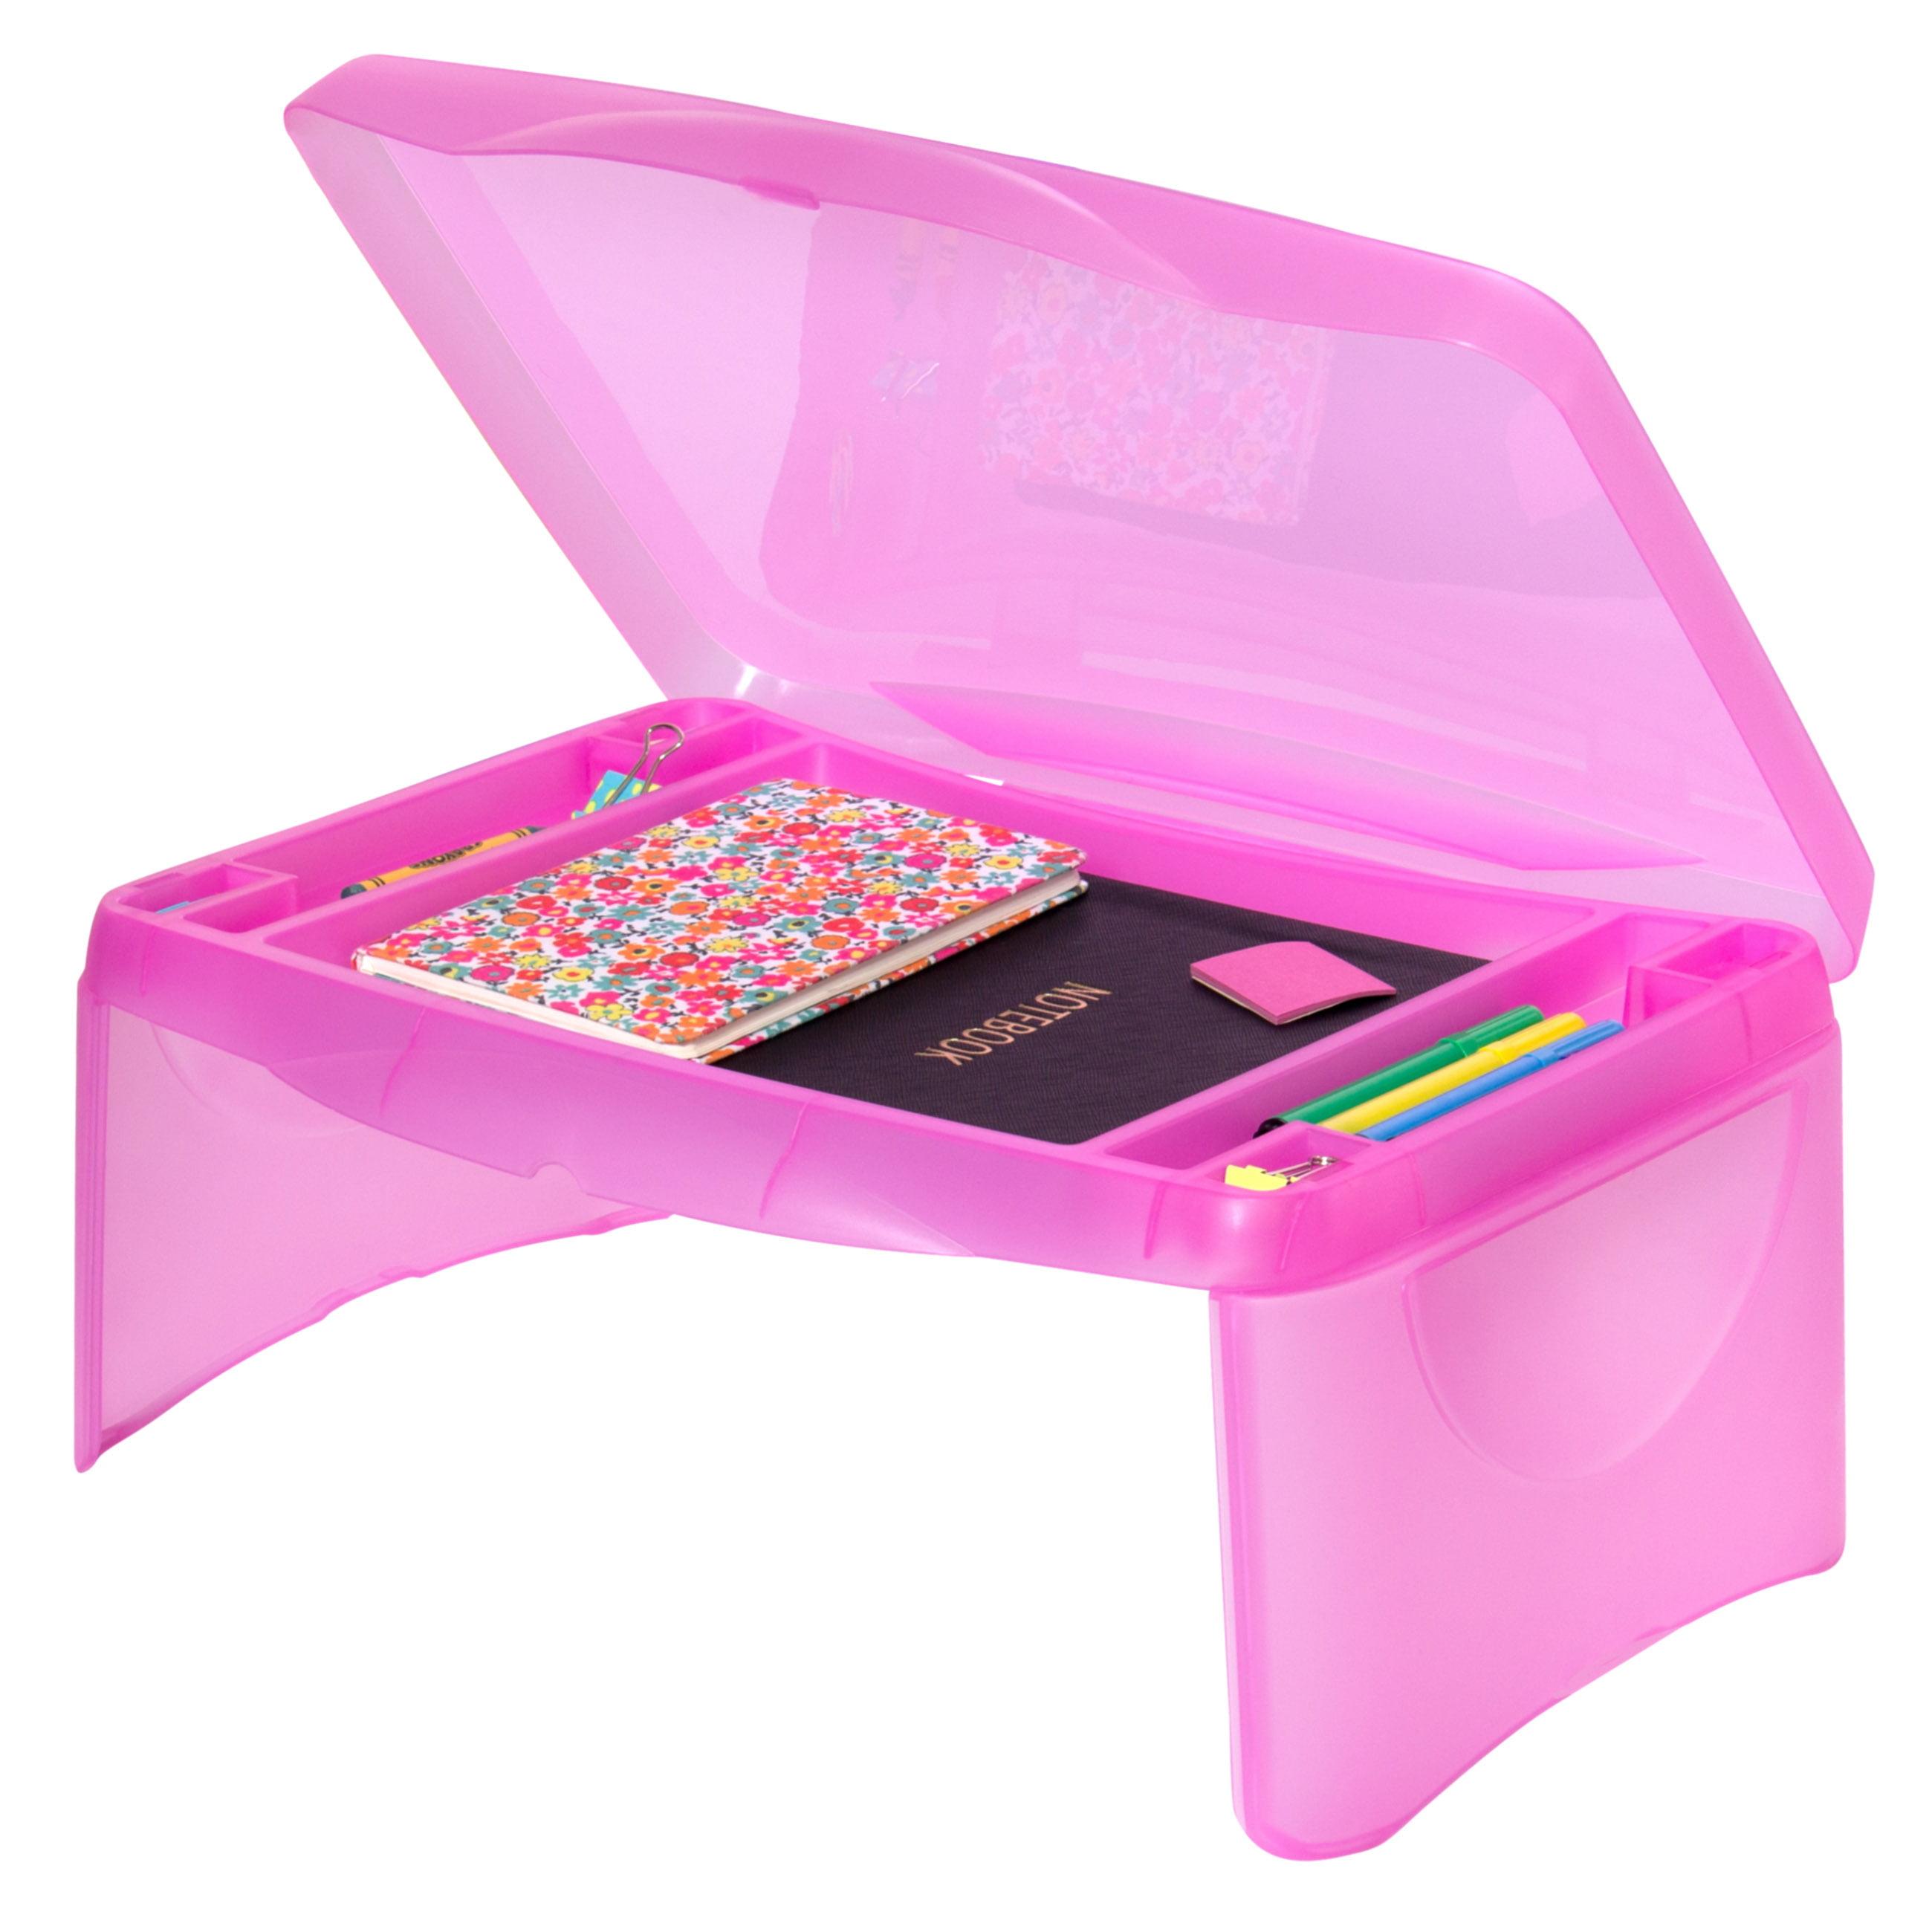 Best Choice Products Kids Folding Lap Desk W/ Storage- Pink ...